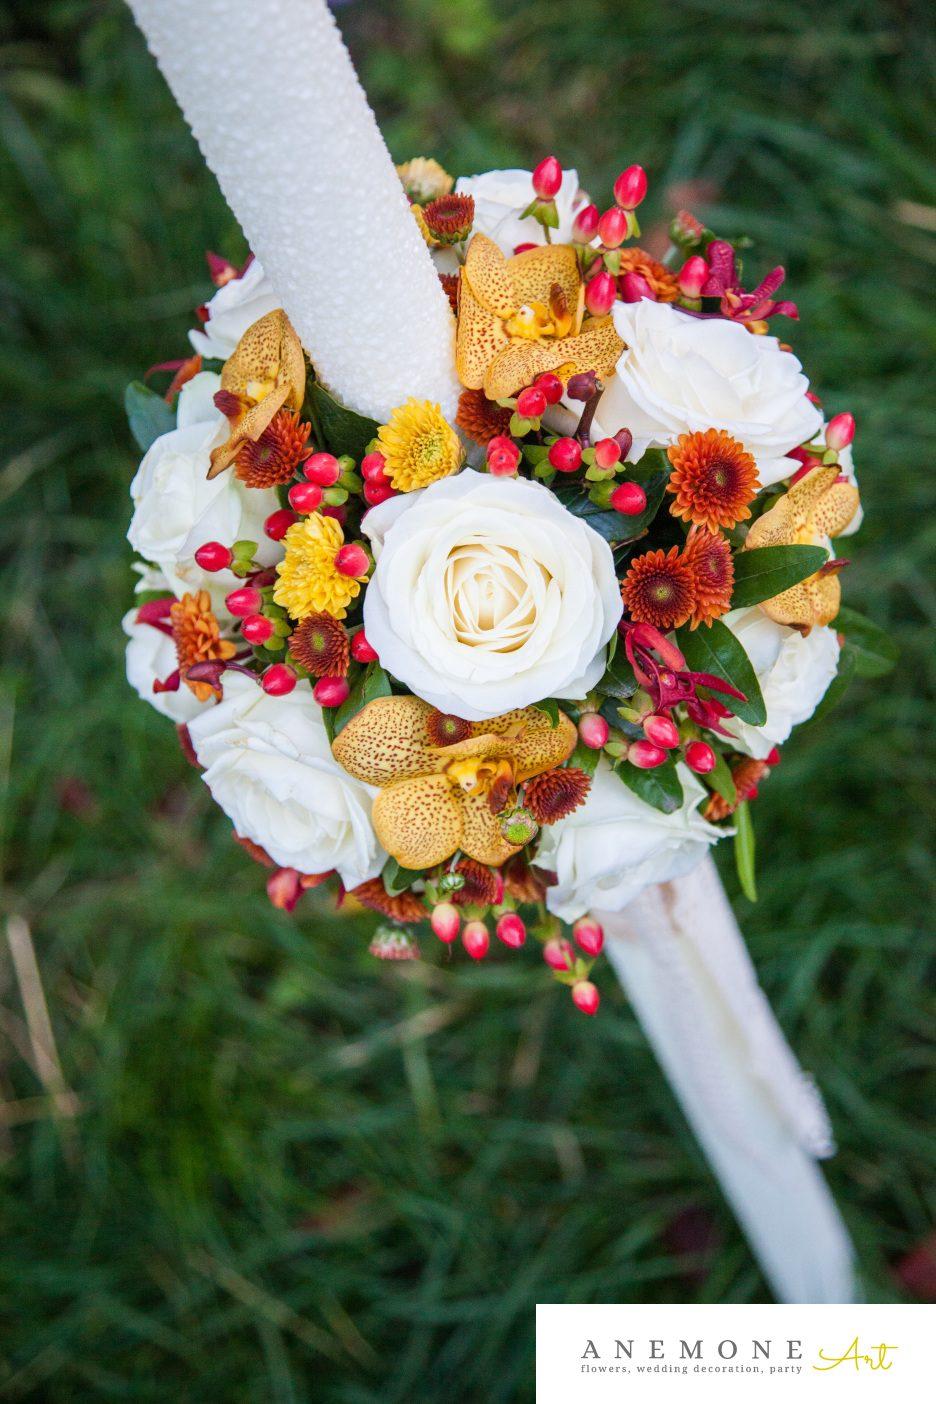 Poza, foto cu Flori de nunta caramiziu, galben, lumanare cununie, vanda in Arad, Timisoara, Oradea (wedding flowers, bouquets) nunta Arad, Timisoara, Oradea